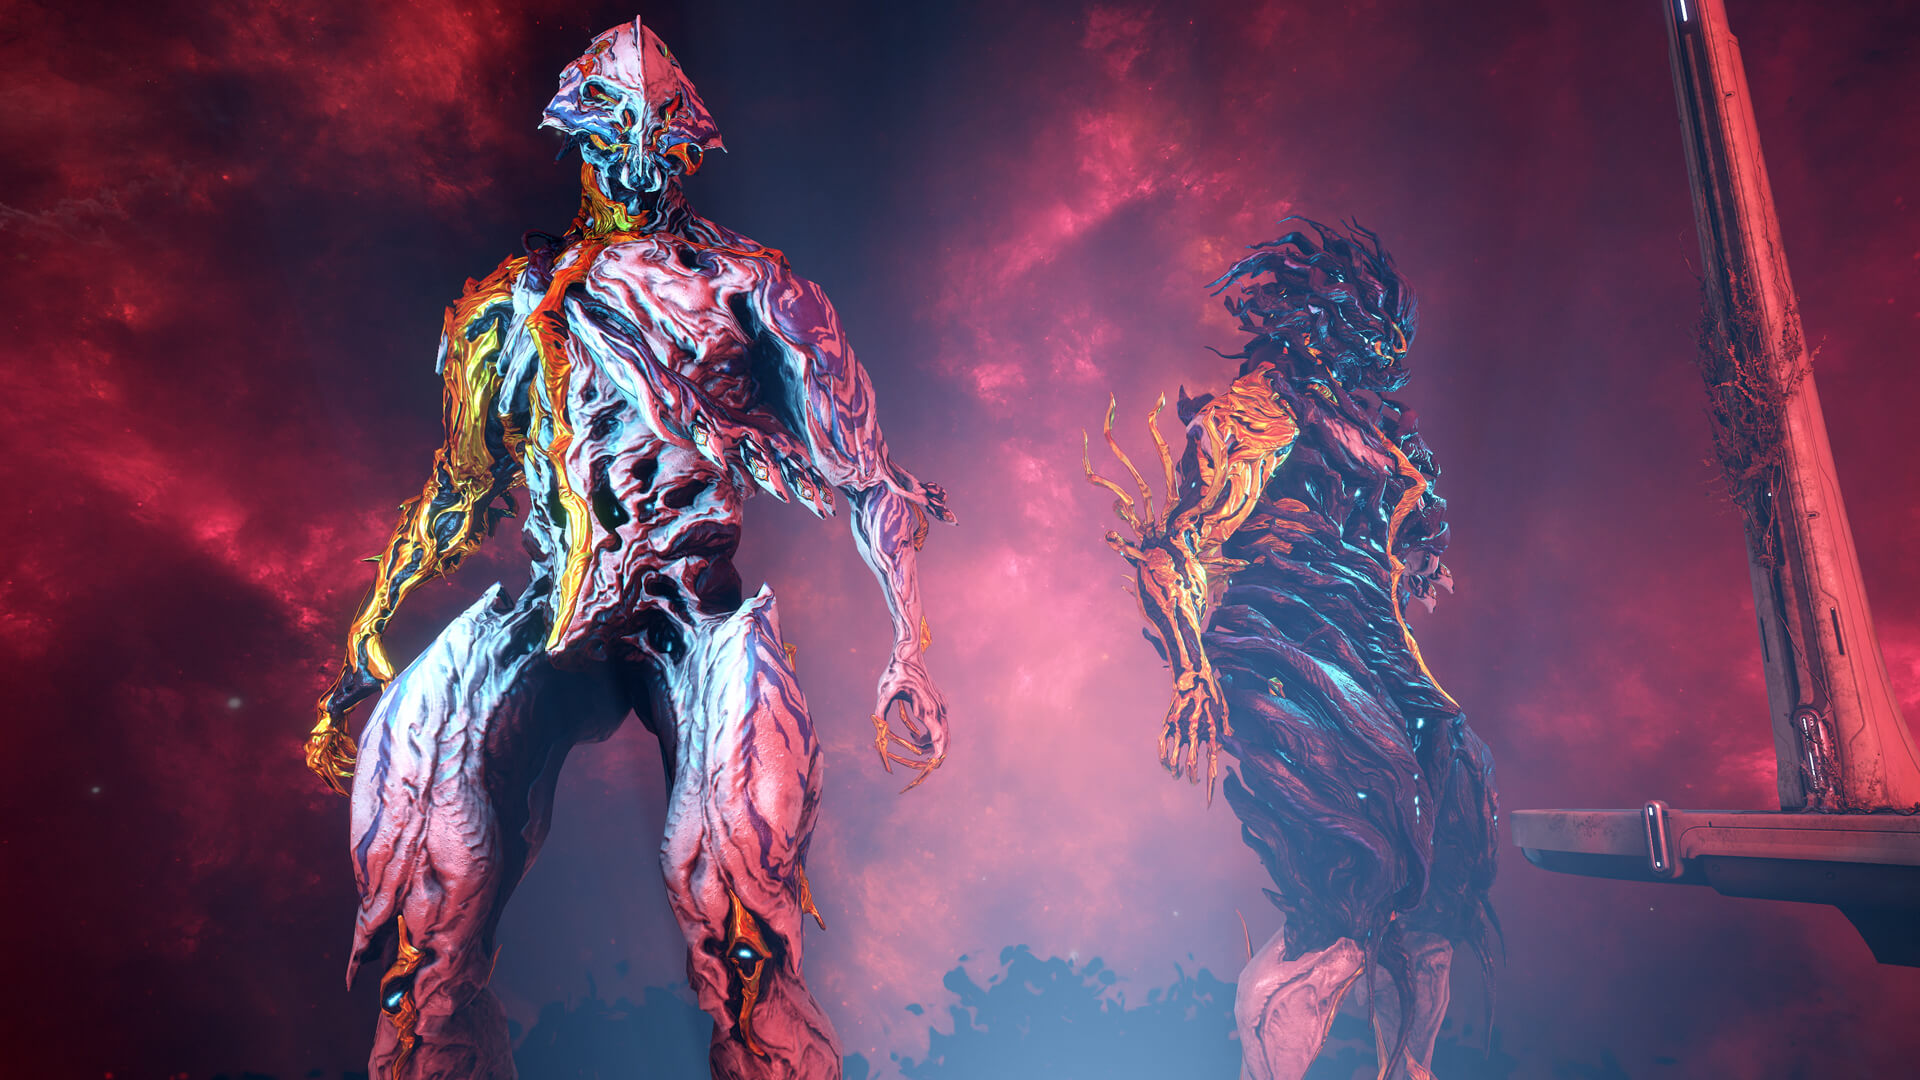 Warframe - the Nidus Prime Warframe stands in elegantly designed armor on a Sentinel battlefield.